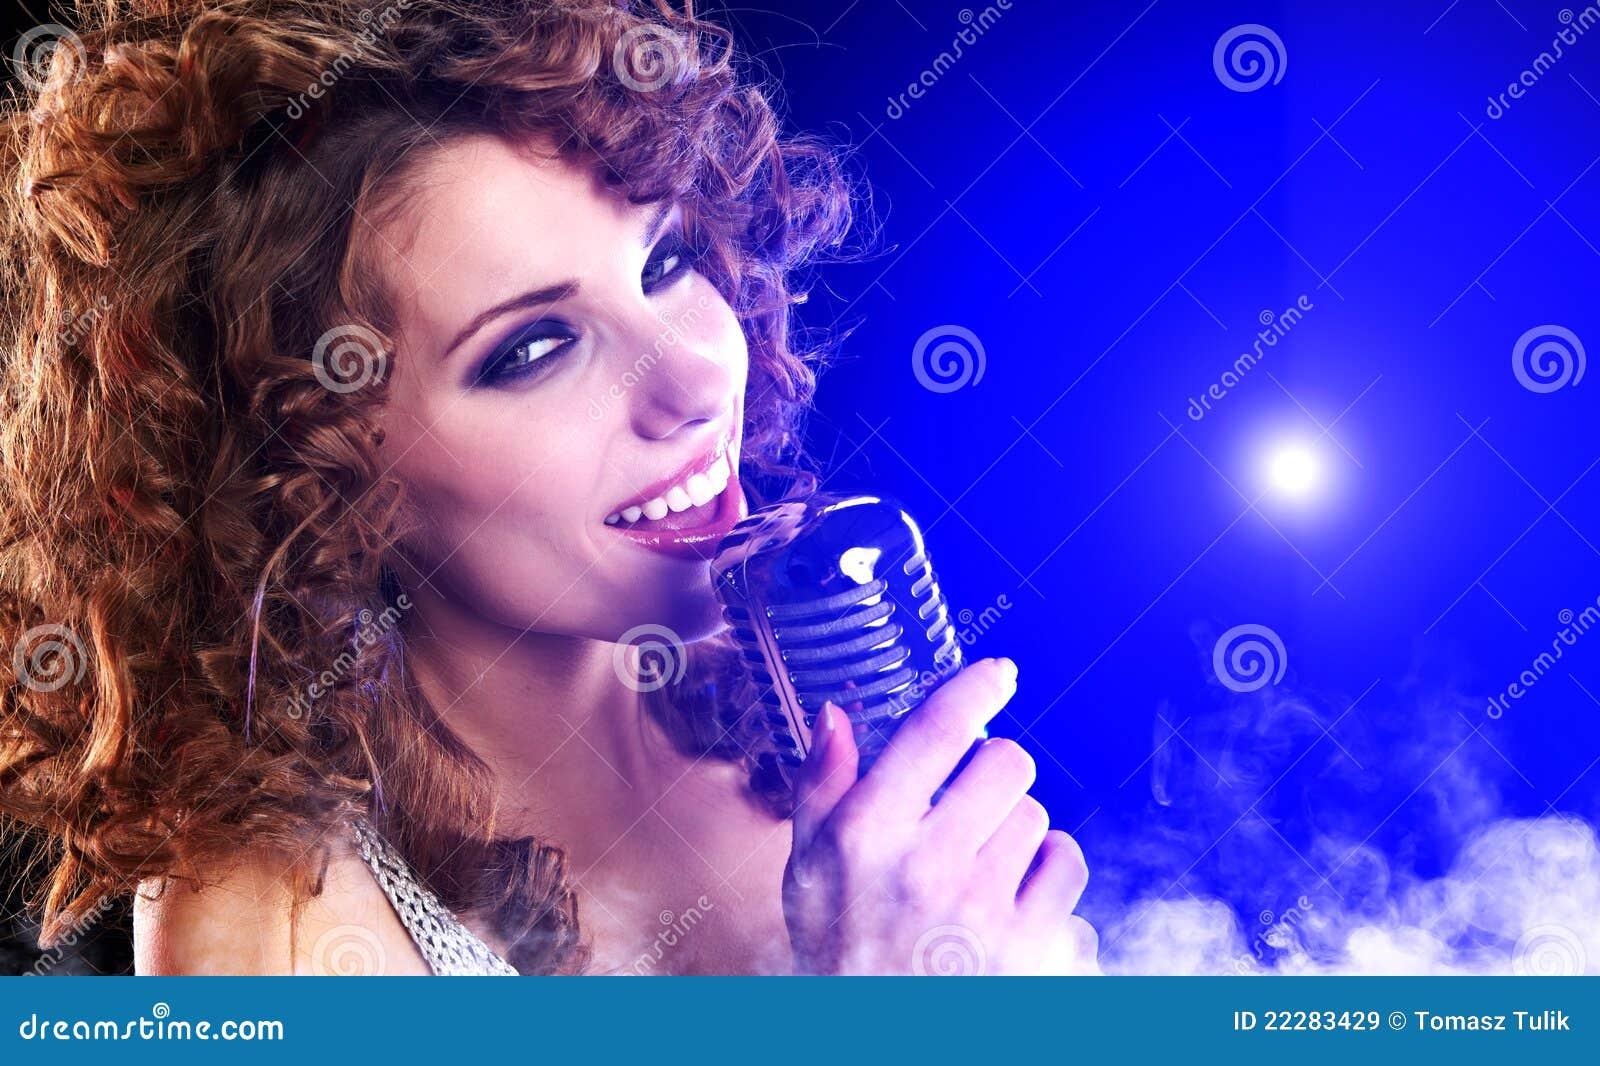 singing the girl retro - photo #5